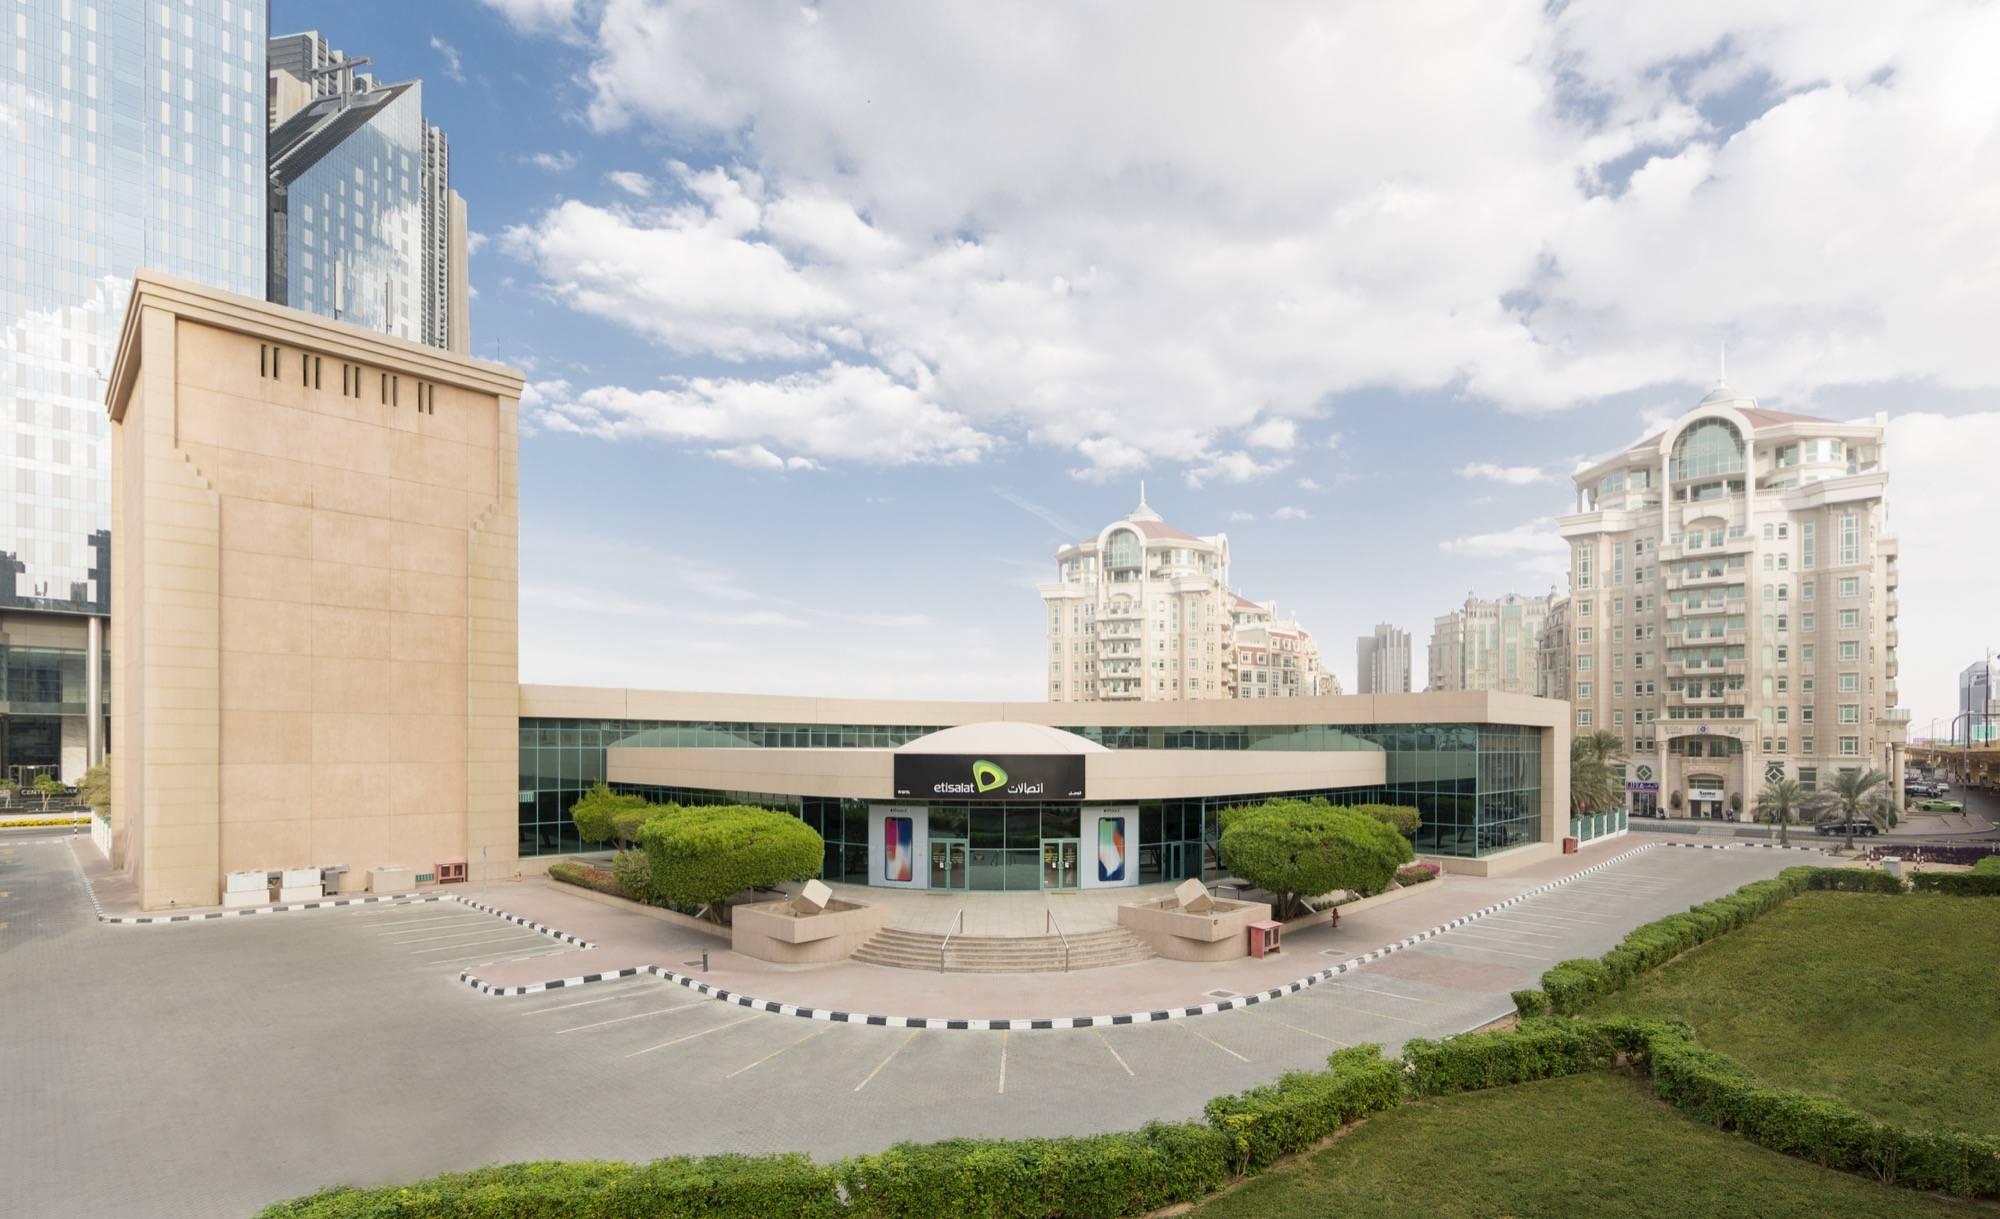 ETISALAT BUILDING